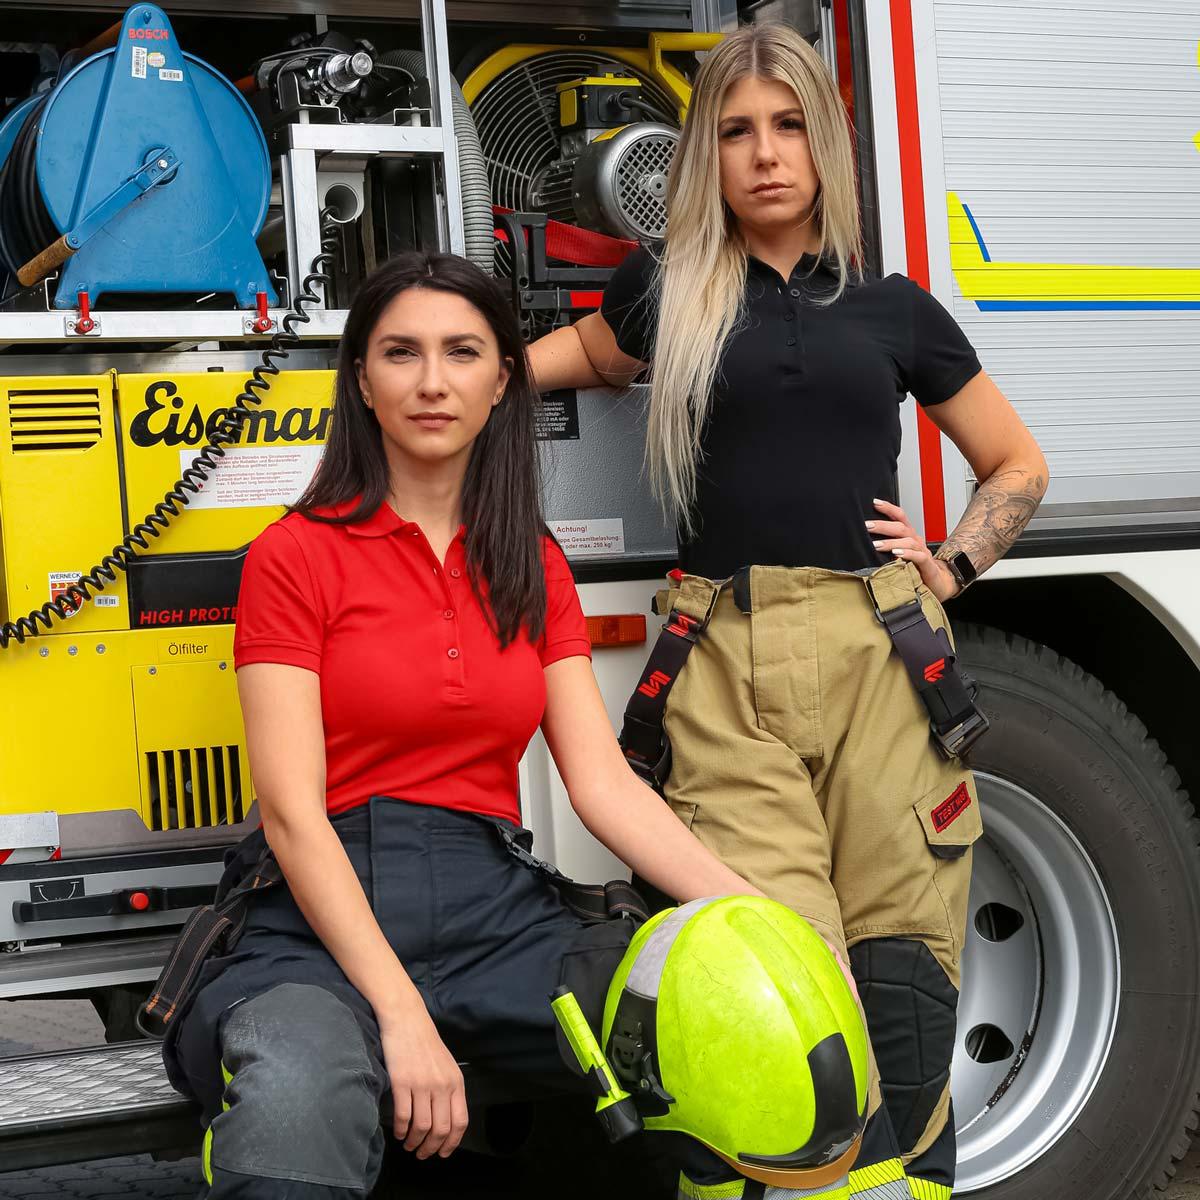 f0097cb91e3622 🚨 BACKDRA FASHION 🚨 - personalisierte Street Fashion für Feuerwehr ...